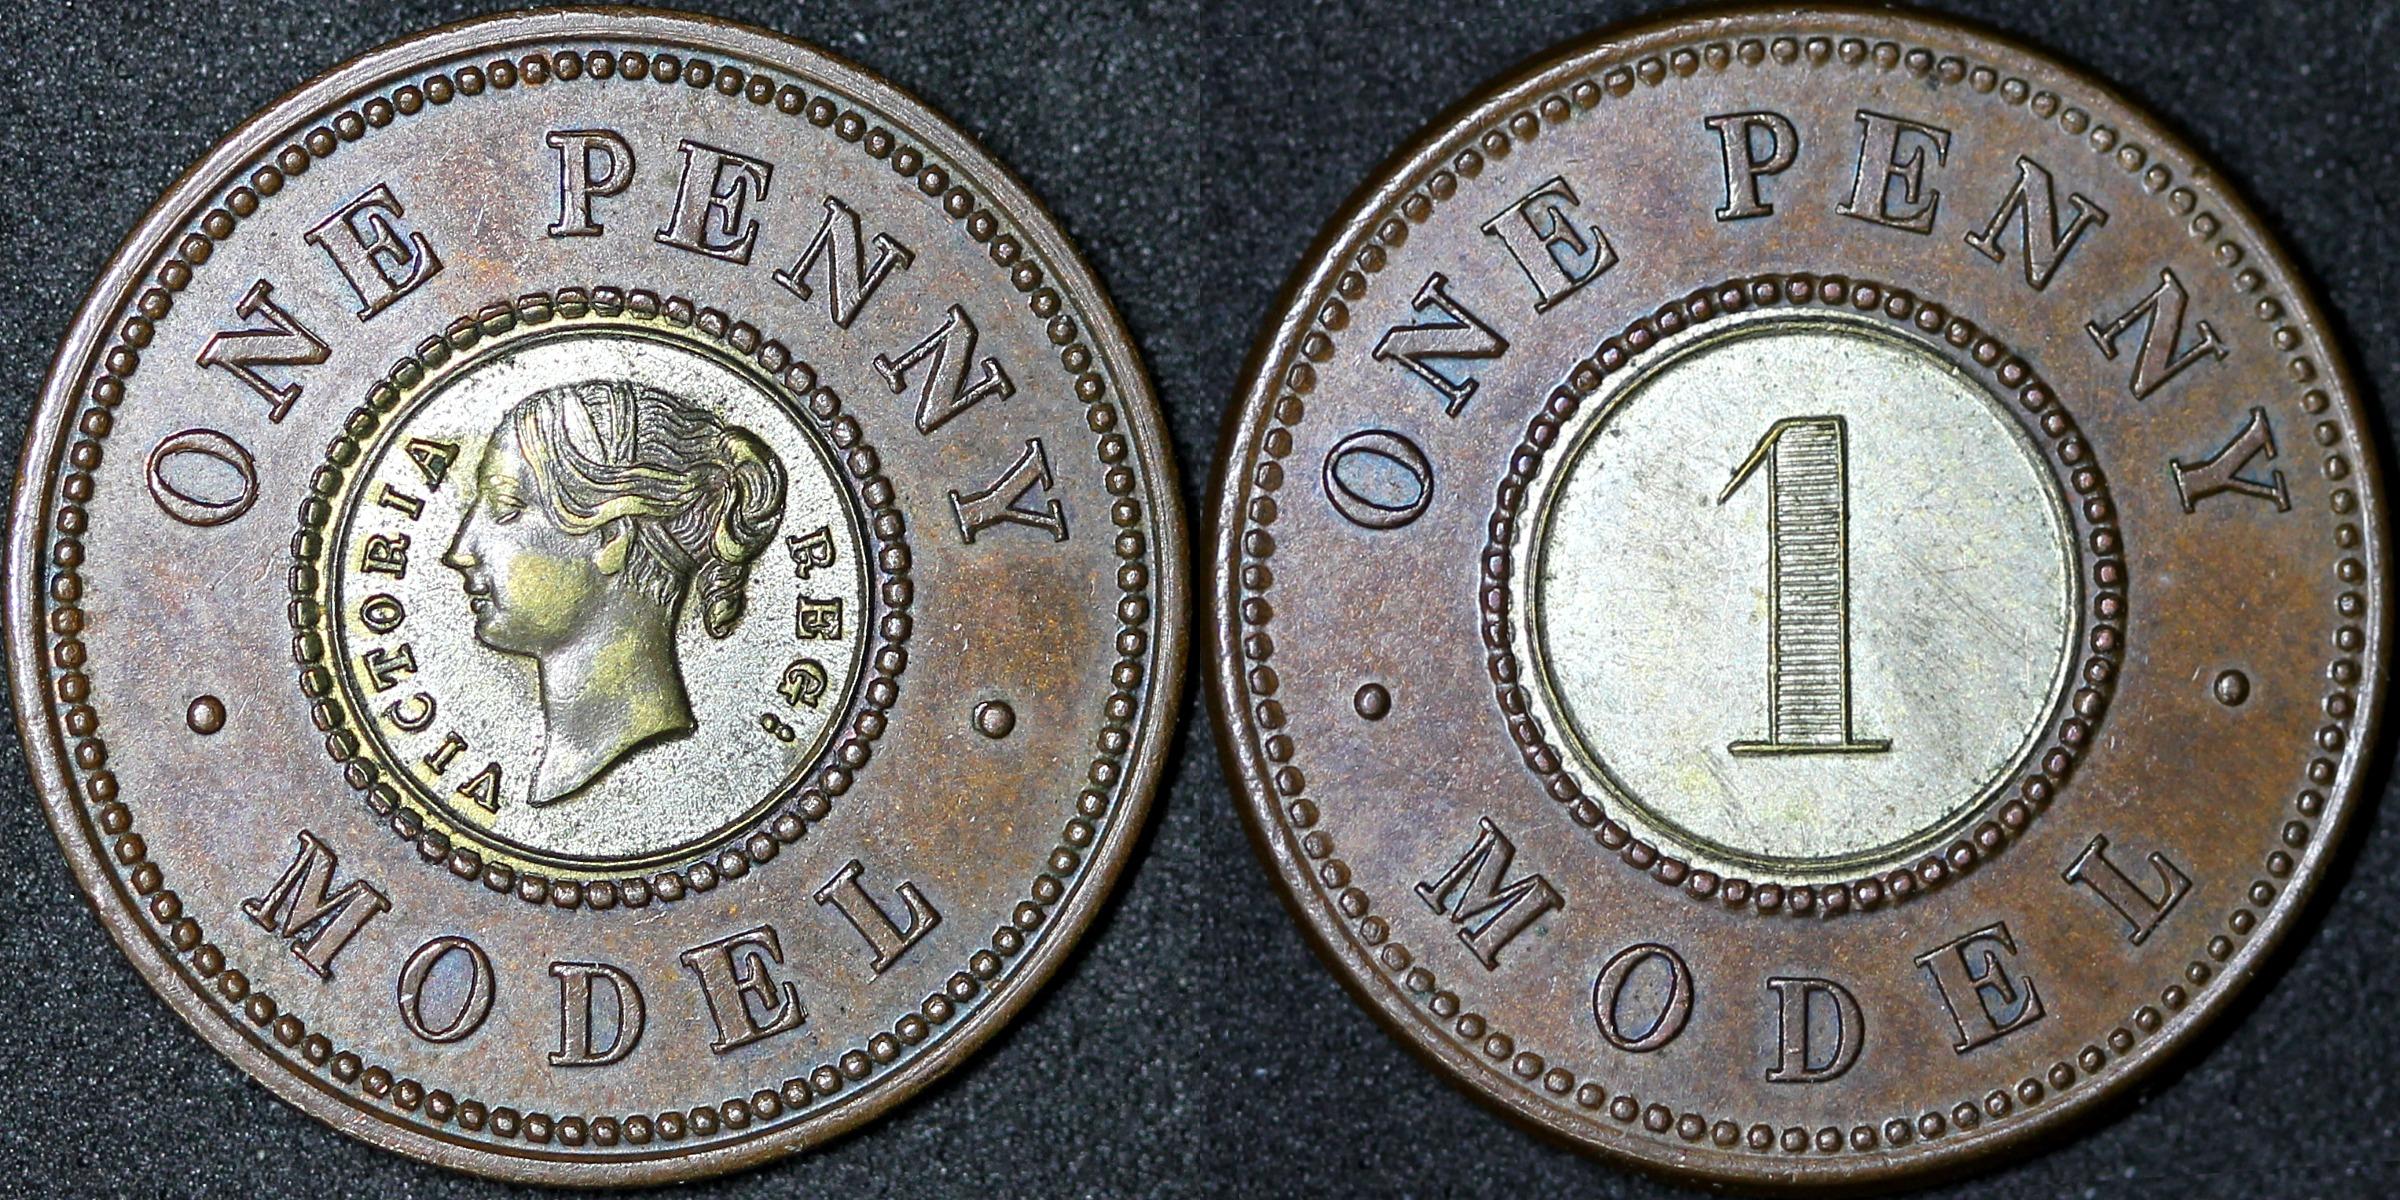 1844_1d_Model_Penny_01_05_2400